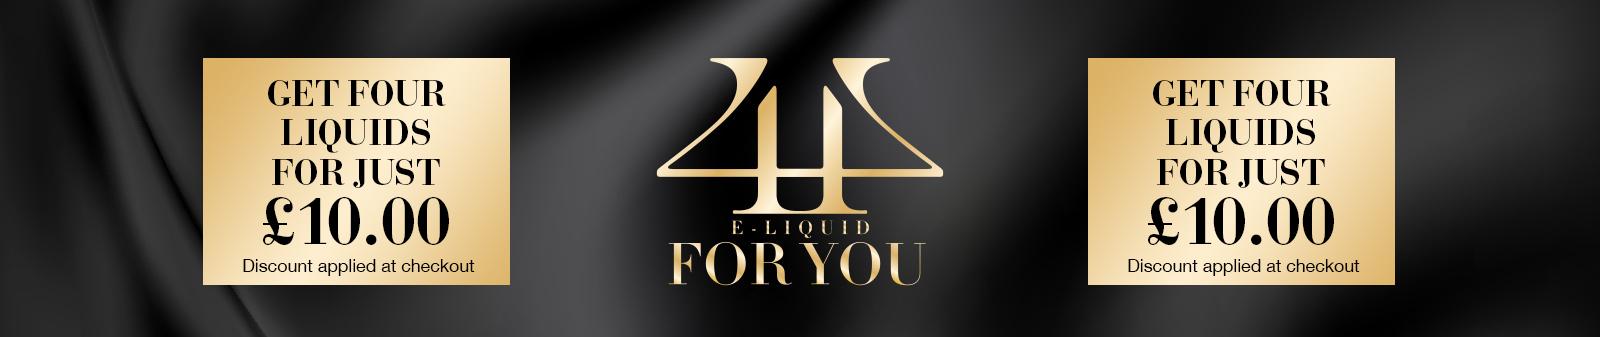 4U Eliquids Special Offer